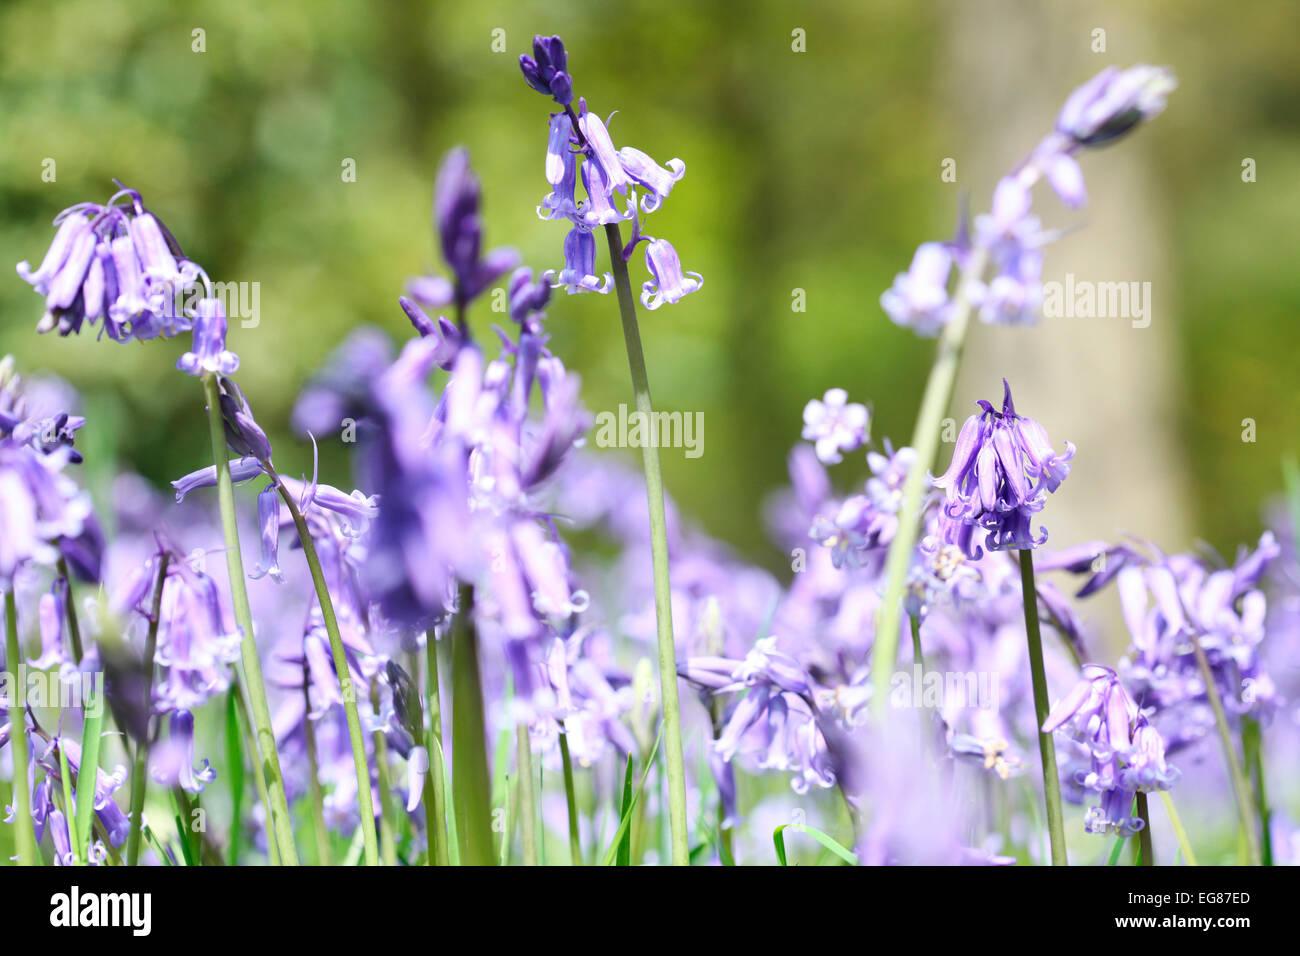 Gorgeous Landscape of Spring Bluebells in England Jane Ann Butler Photography JABP793 Stock Photo